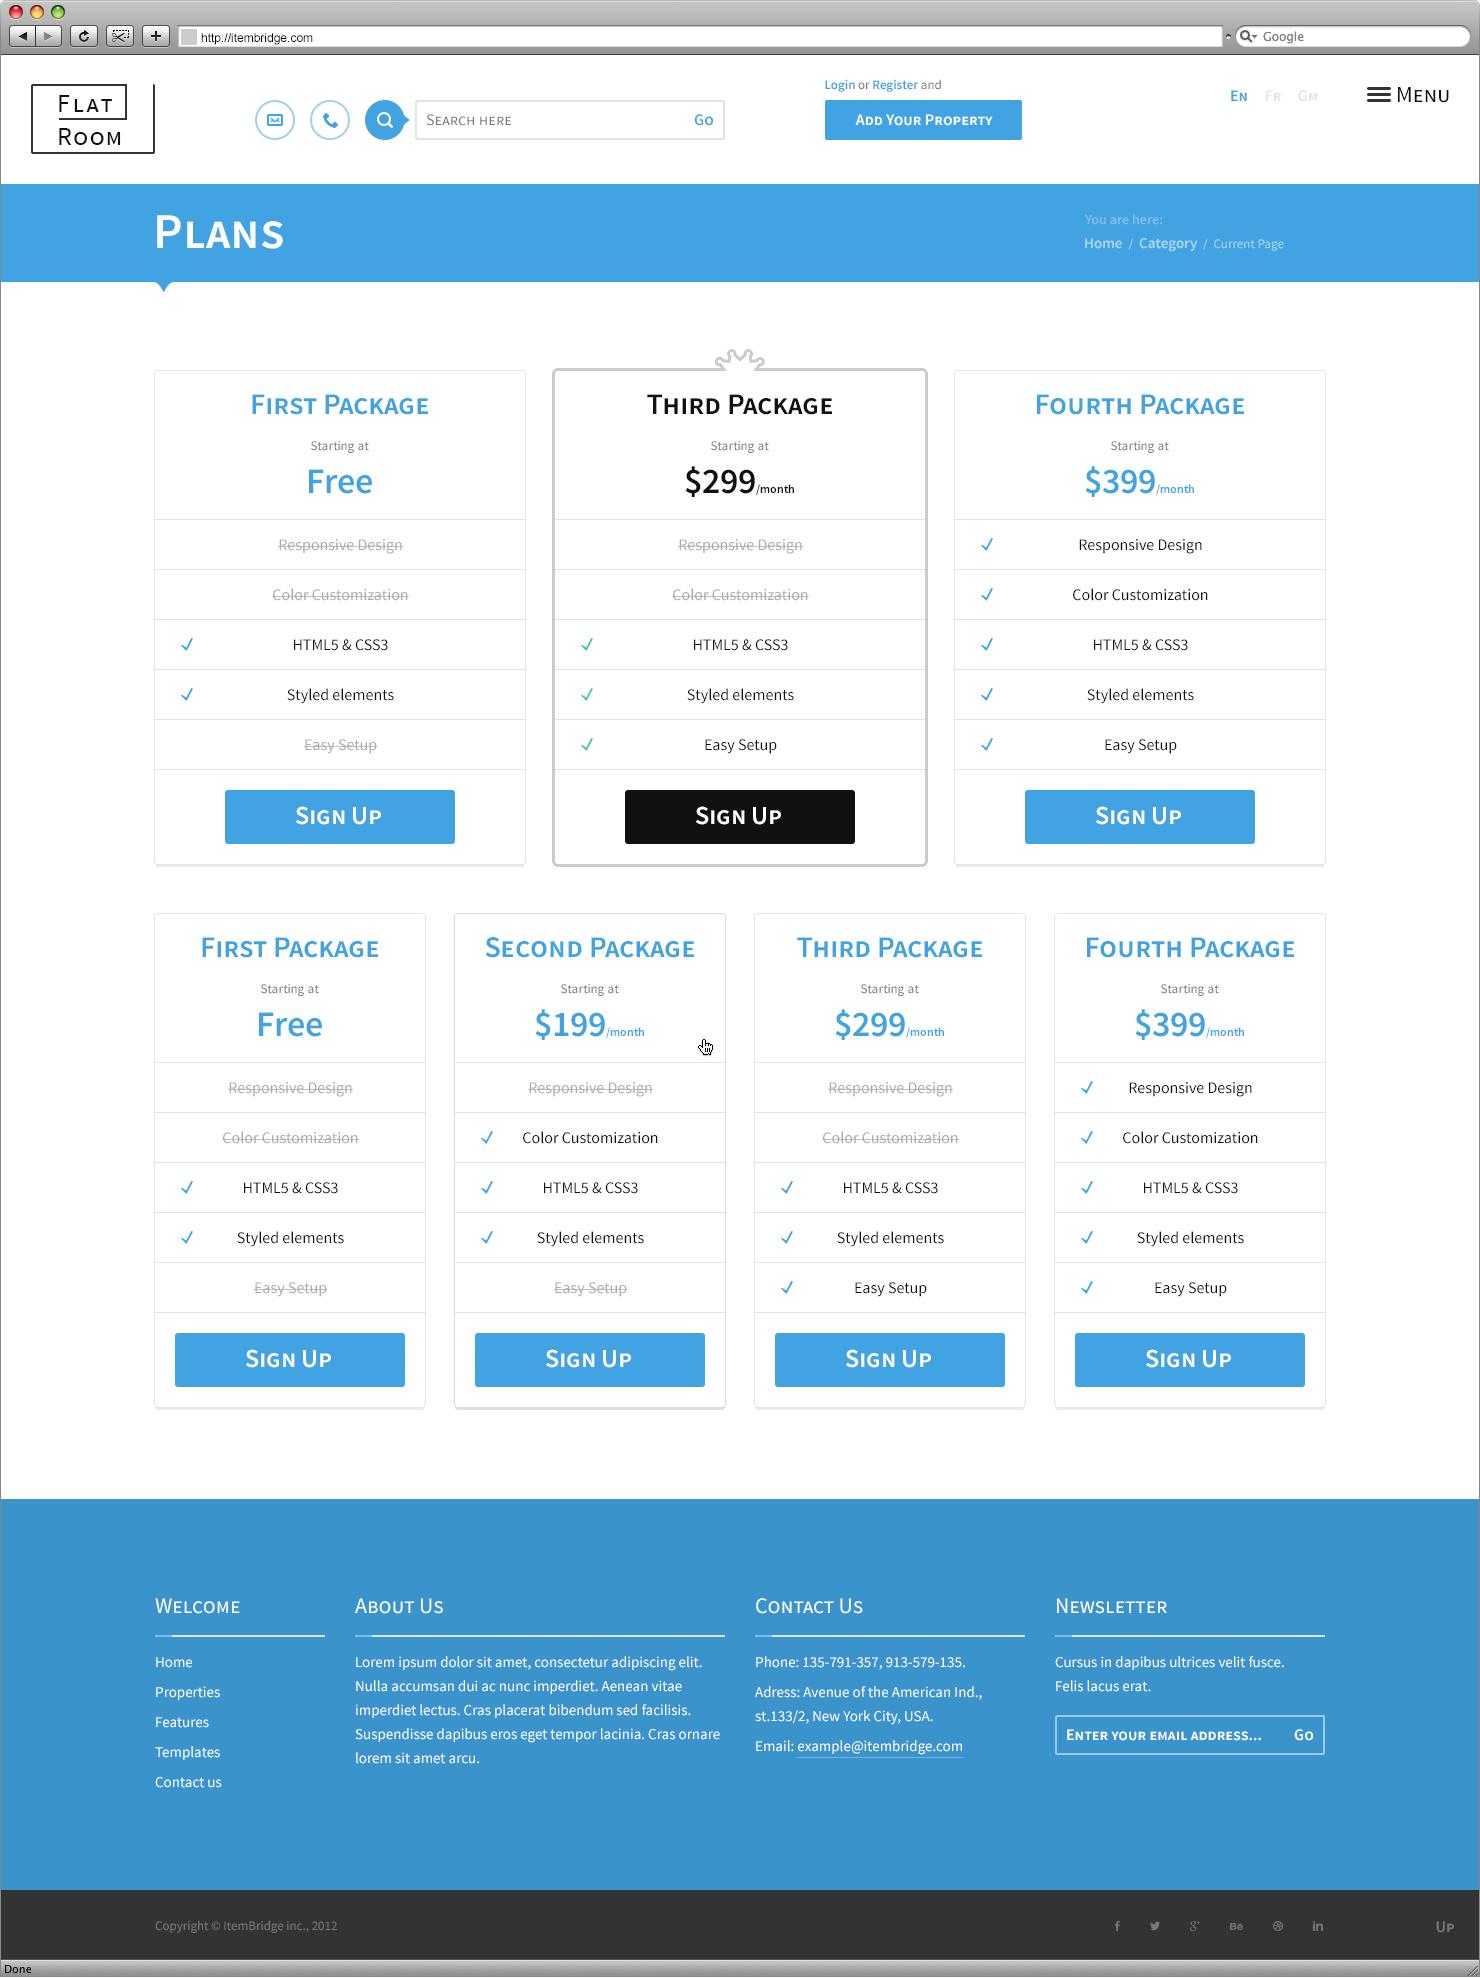 FlatRoom — Responsive Real Estate WordPress Theme